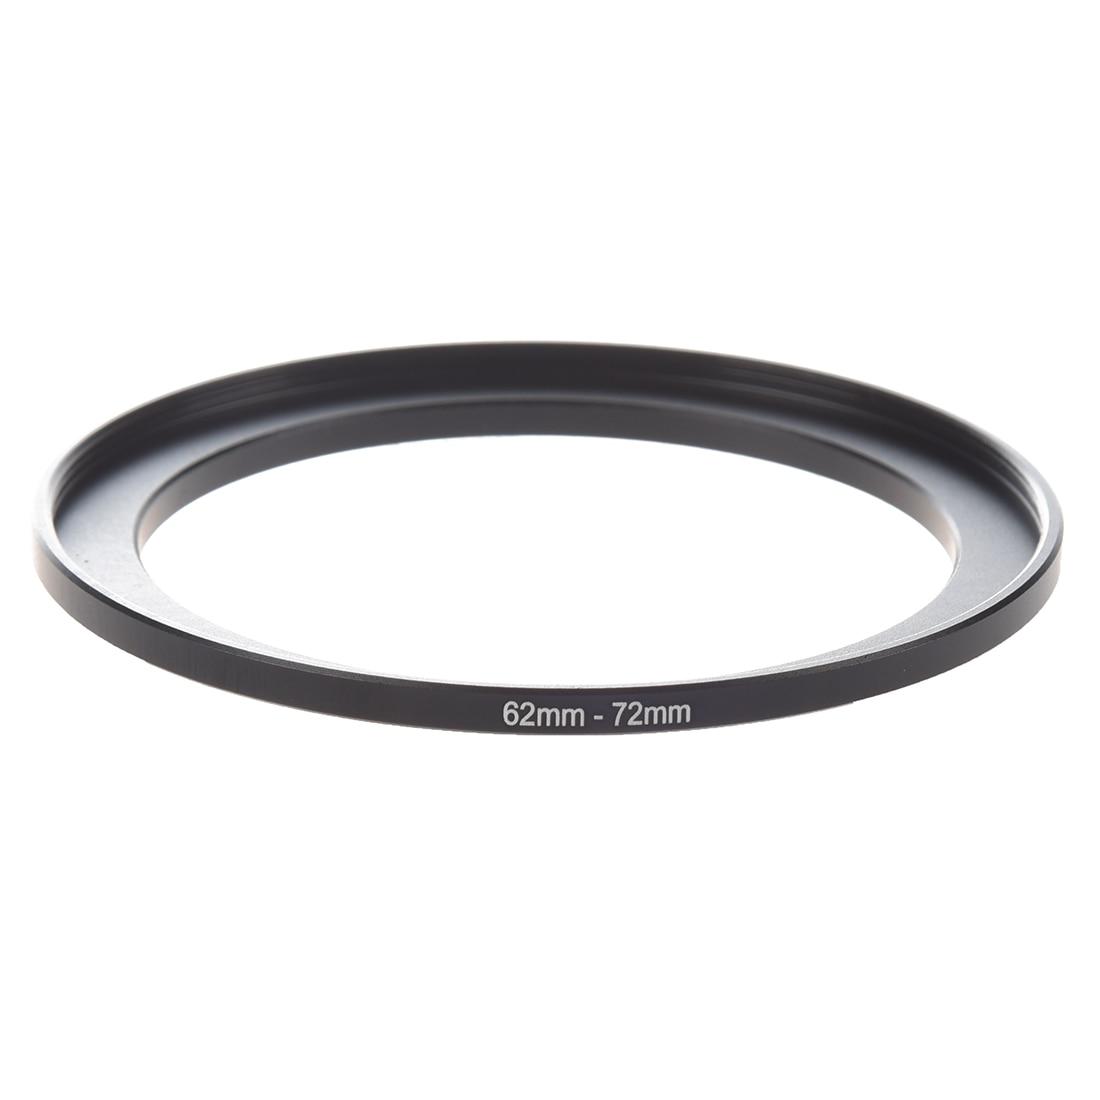 Camera Parts 62mm-72mm Lens Filter Step Up Ring Adapter Black